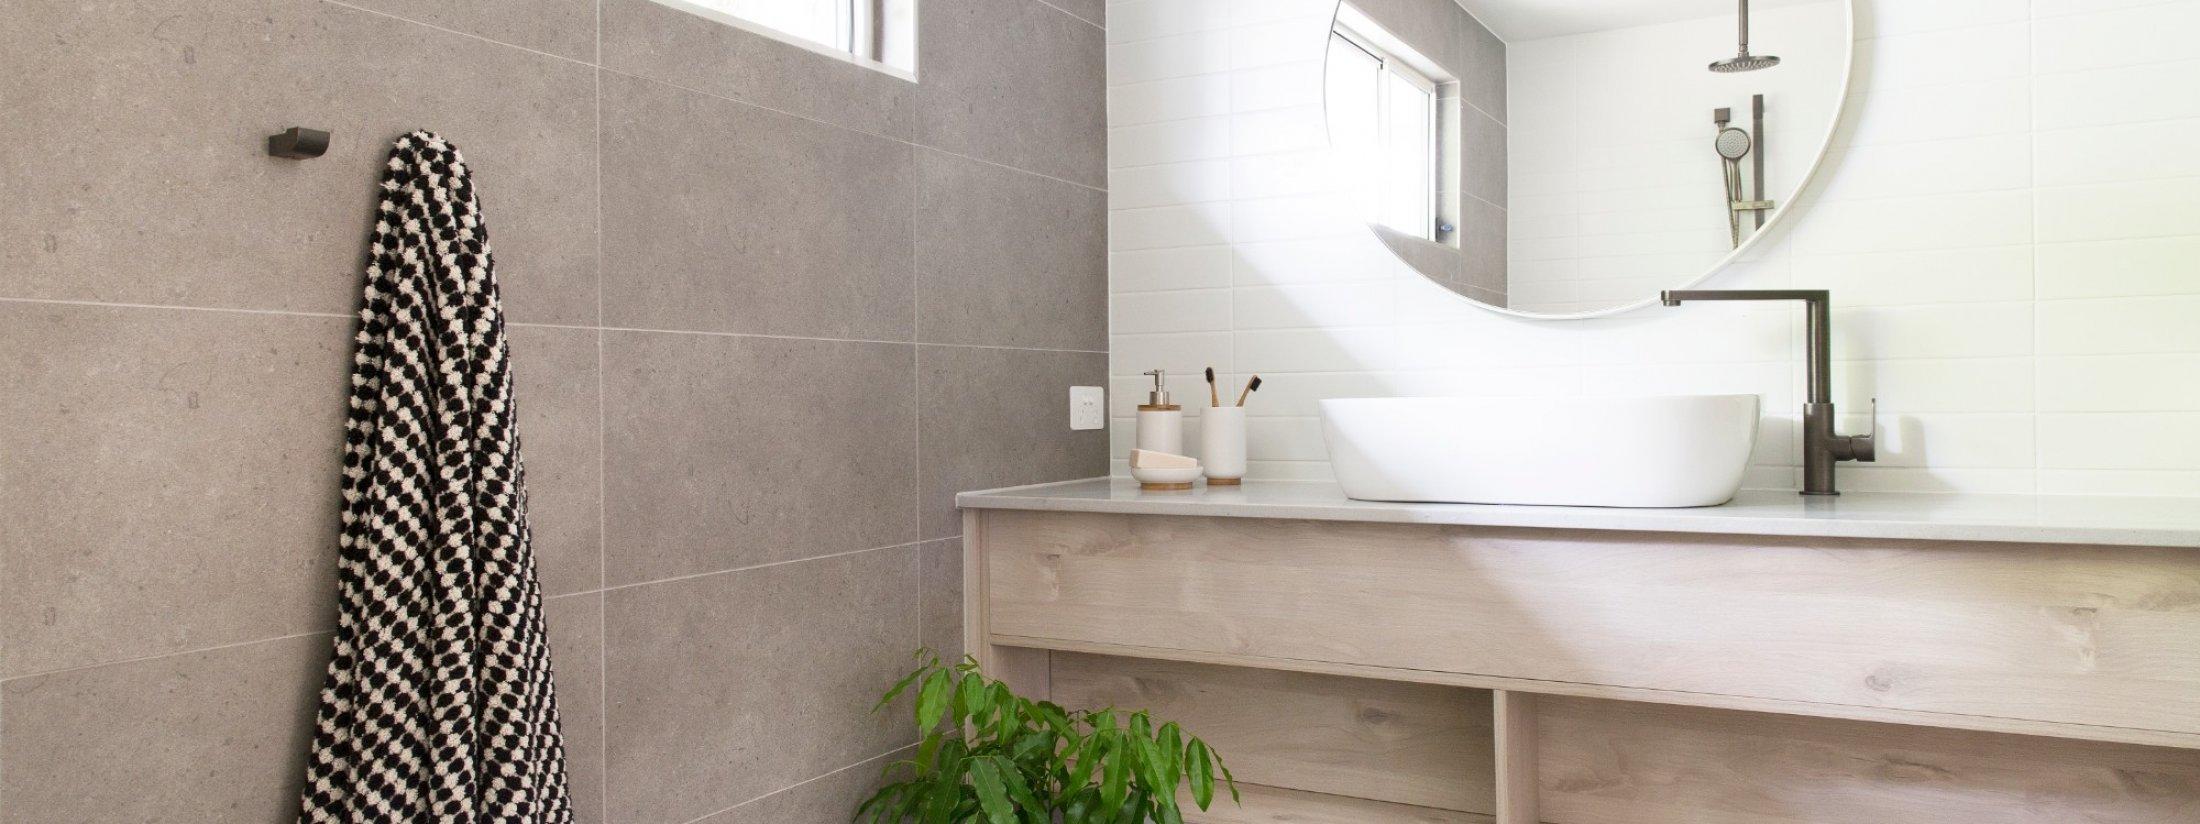 Barrel and Branch - Byron Bay - studio bathroom vanity